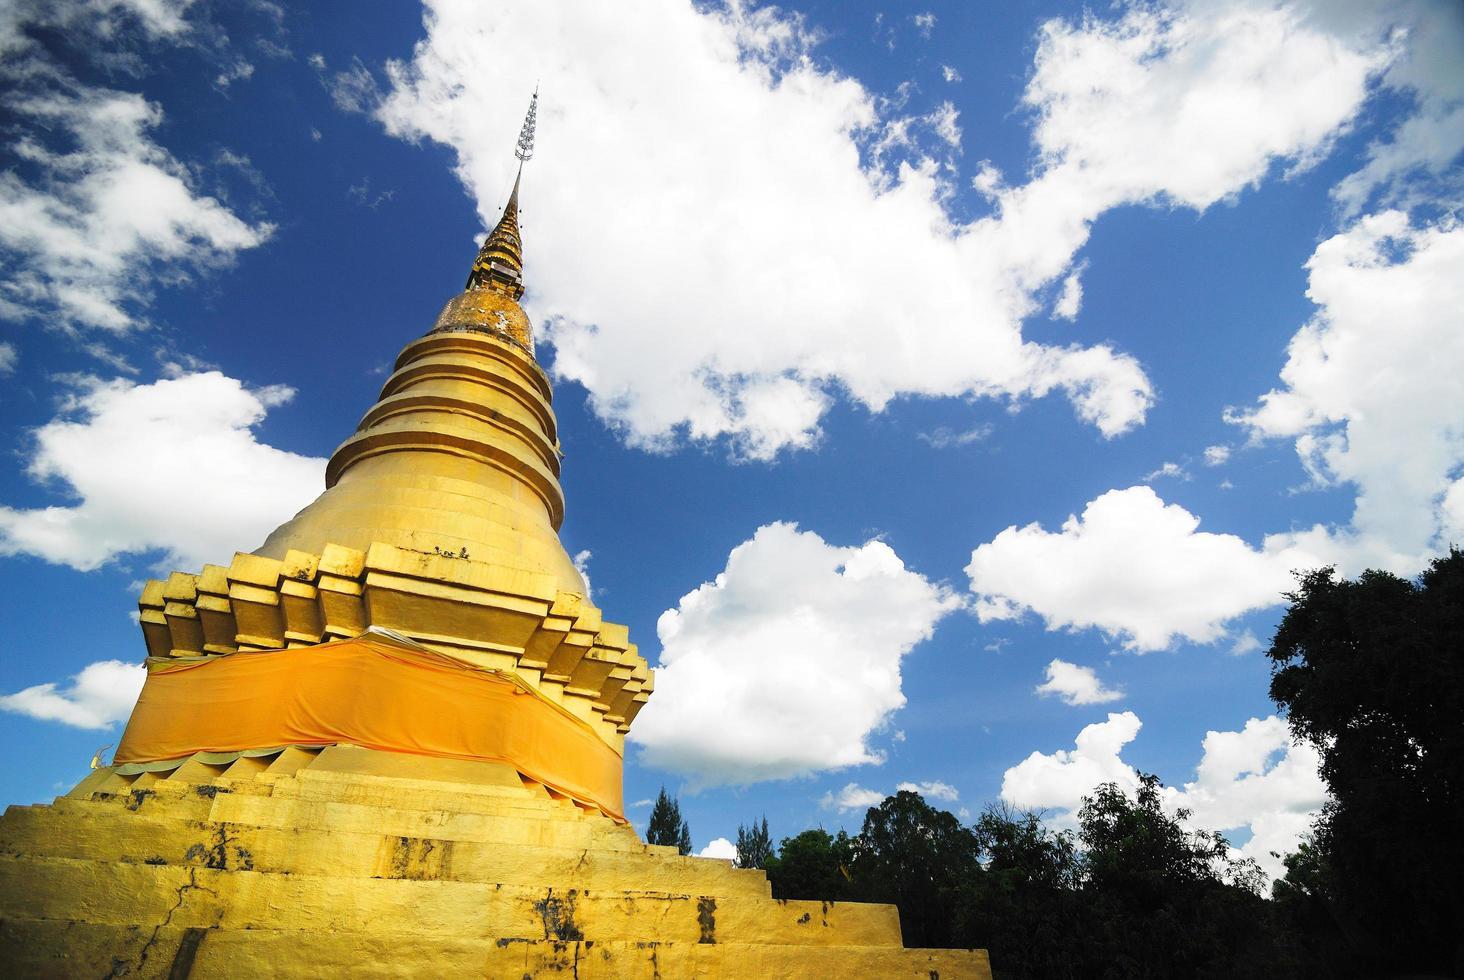 Wat Phrathat tempio jomping a Lampang, Thailandia foto